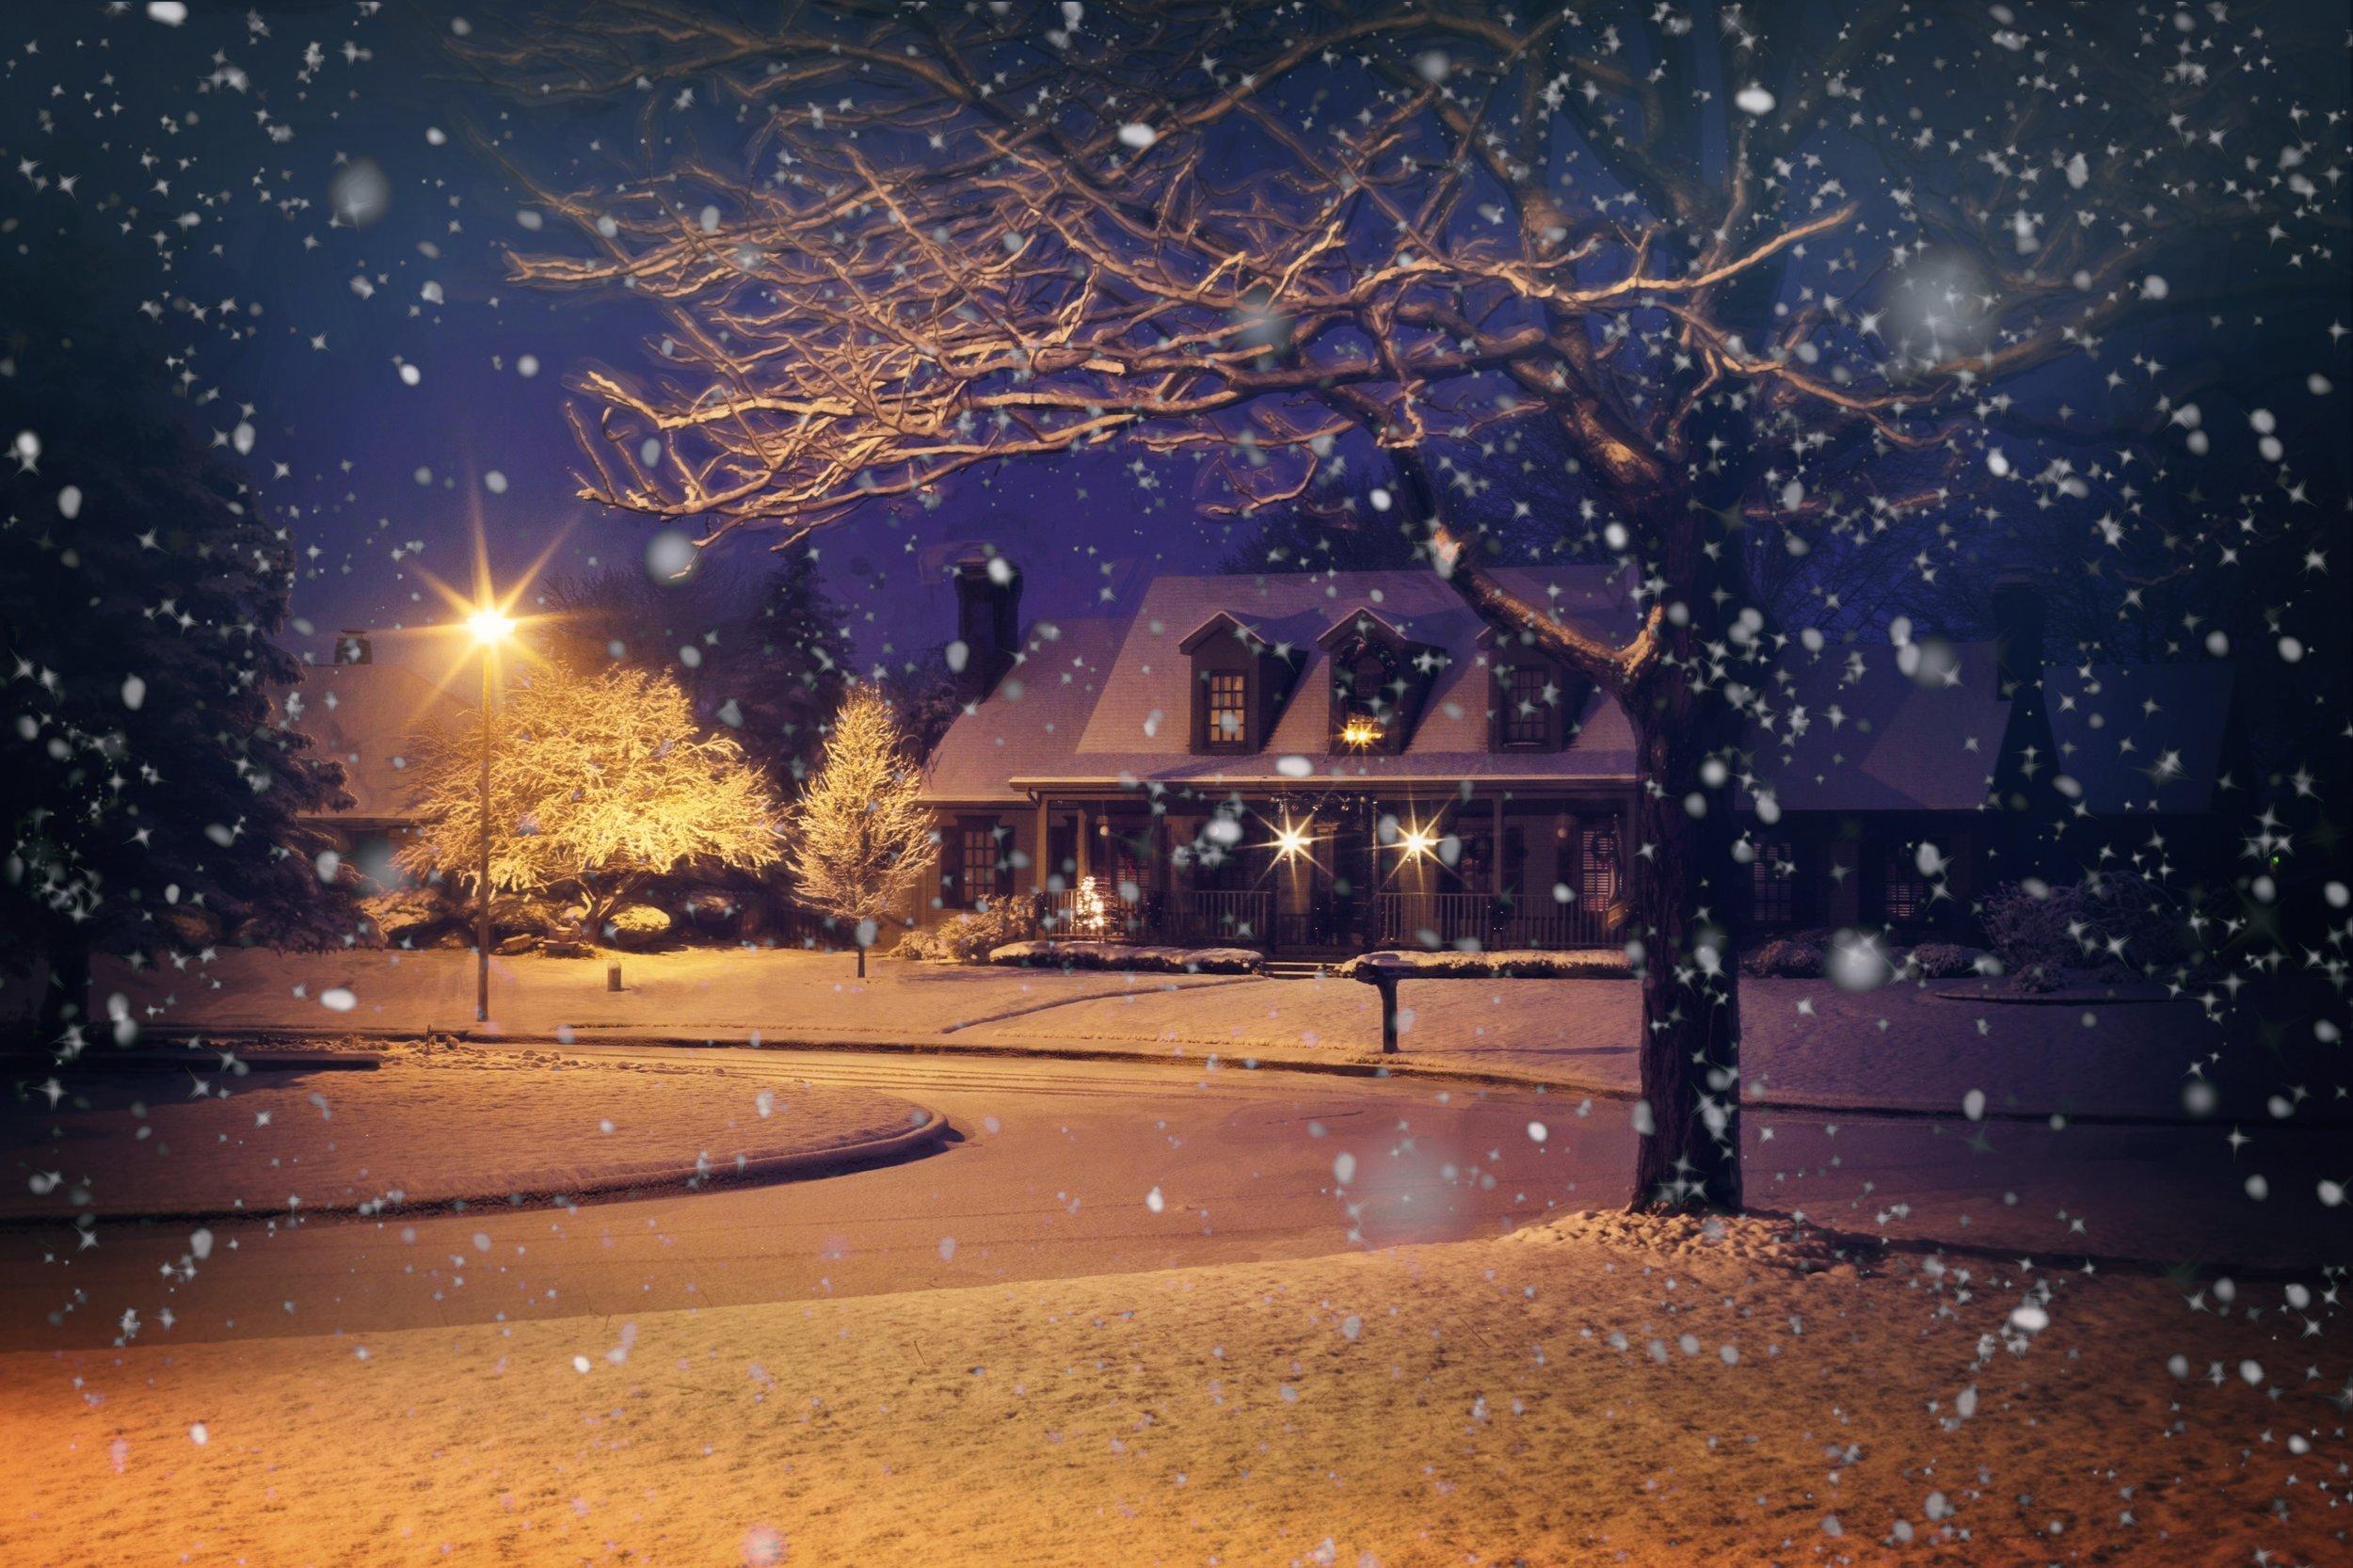 Sell_House_in_Winter.jpg